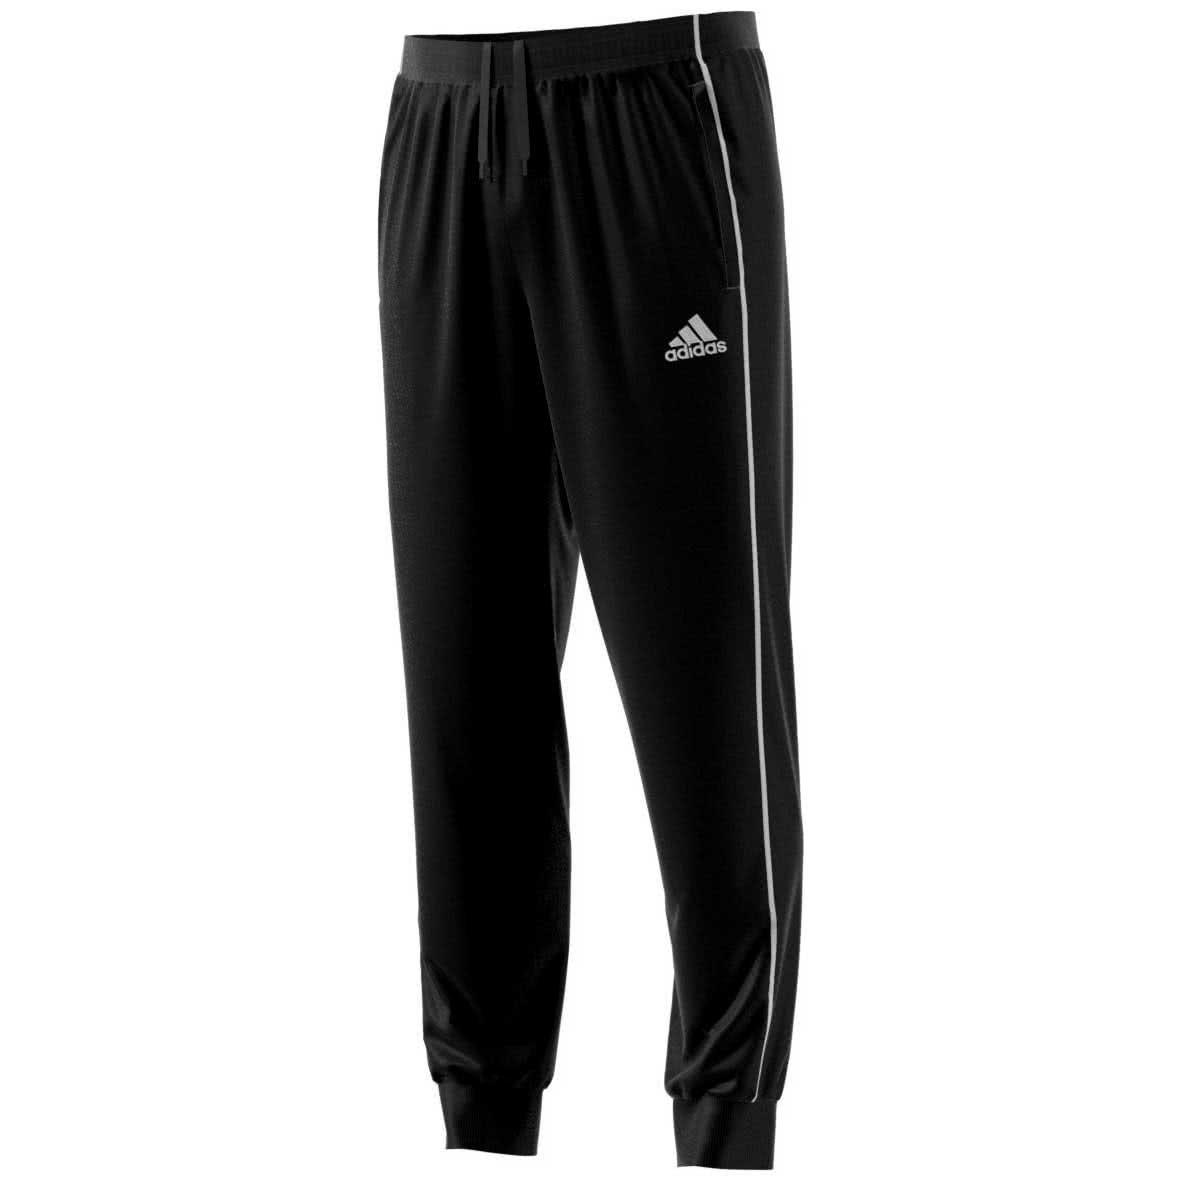 adidas Men's CORE18Sweat Pants Jogging Bottoms, Men, Core18 Sweat Pants